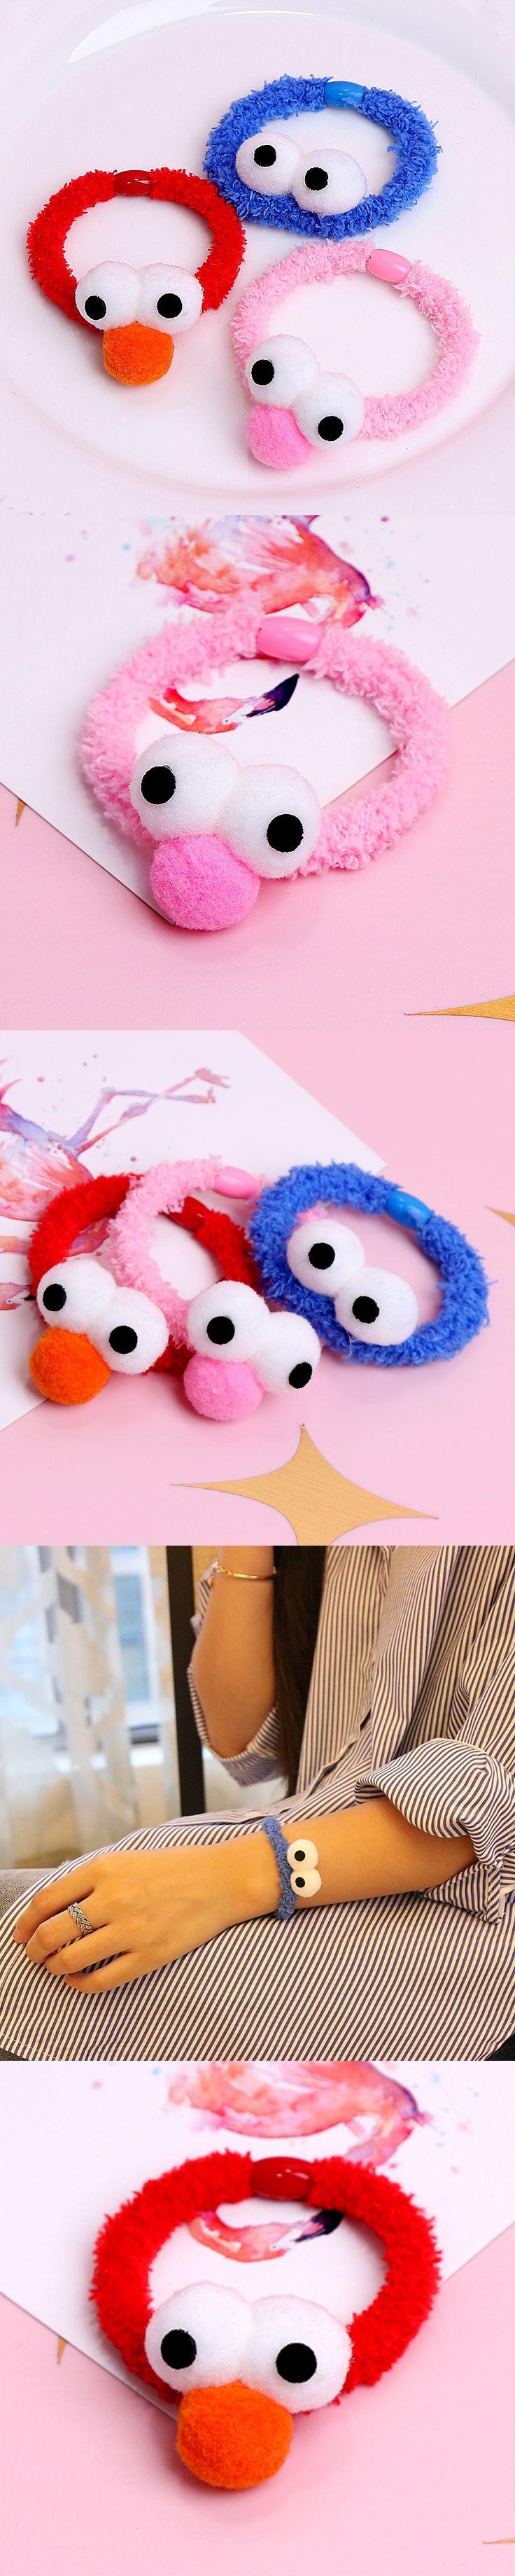 New Korean Cute Cartoon Stereo Plush Big Eyes Headband For Girls Women Lovely Hair Rope Rubber Band Hair Accessories